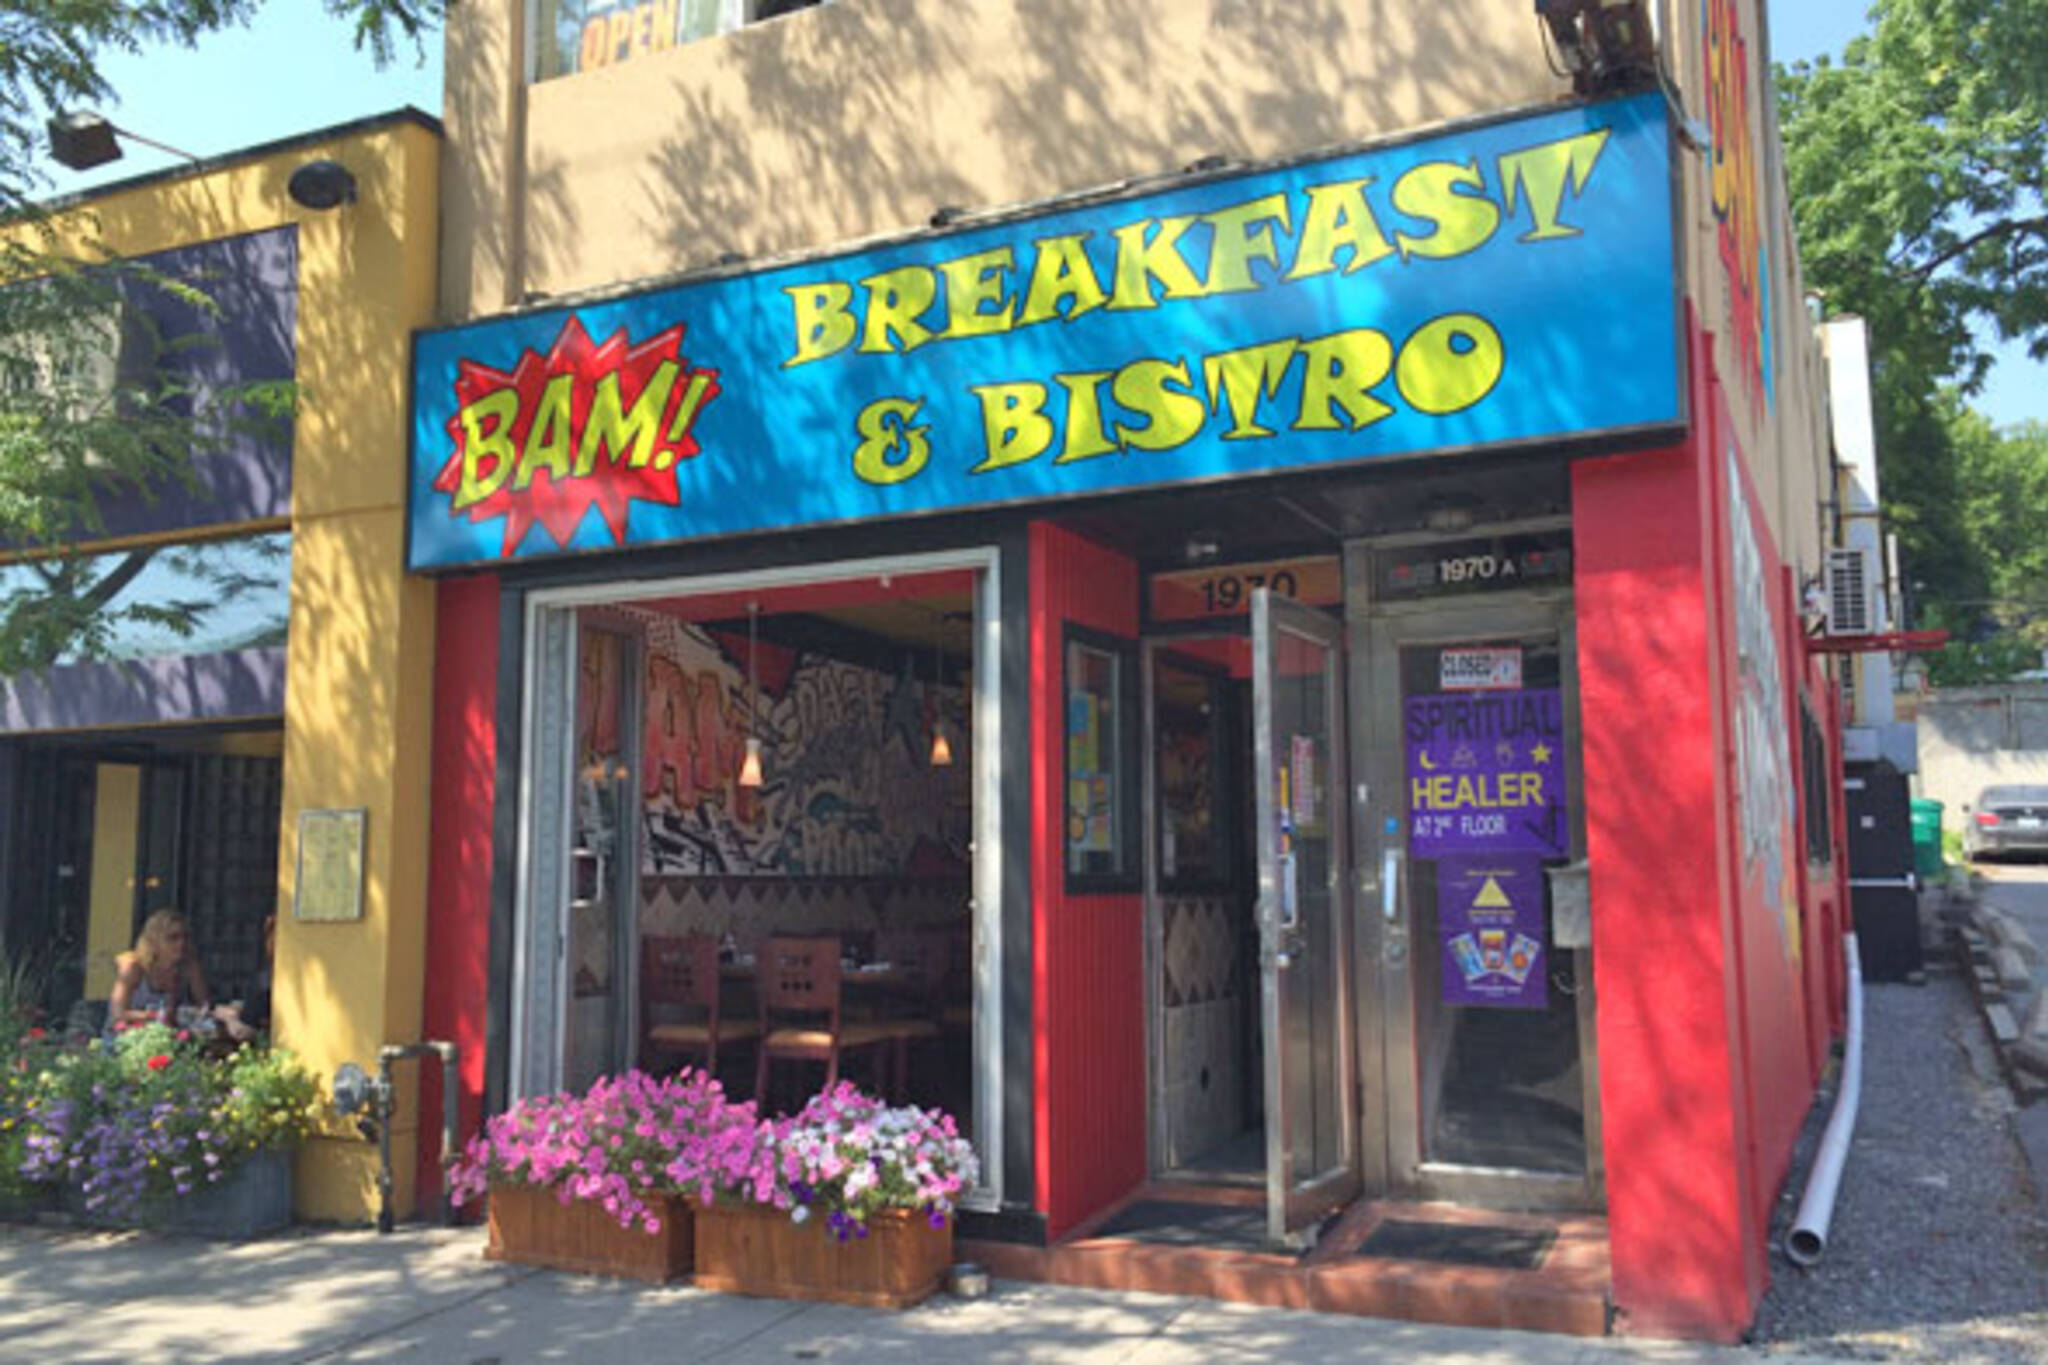 bam breakfast bistro toronto